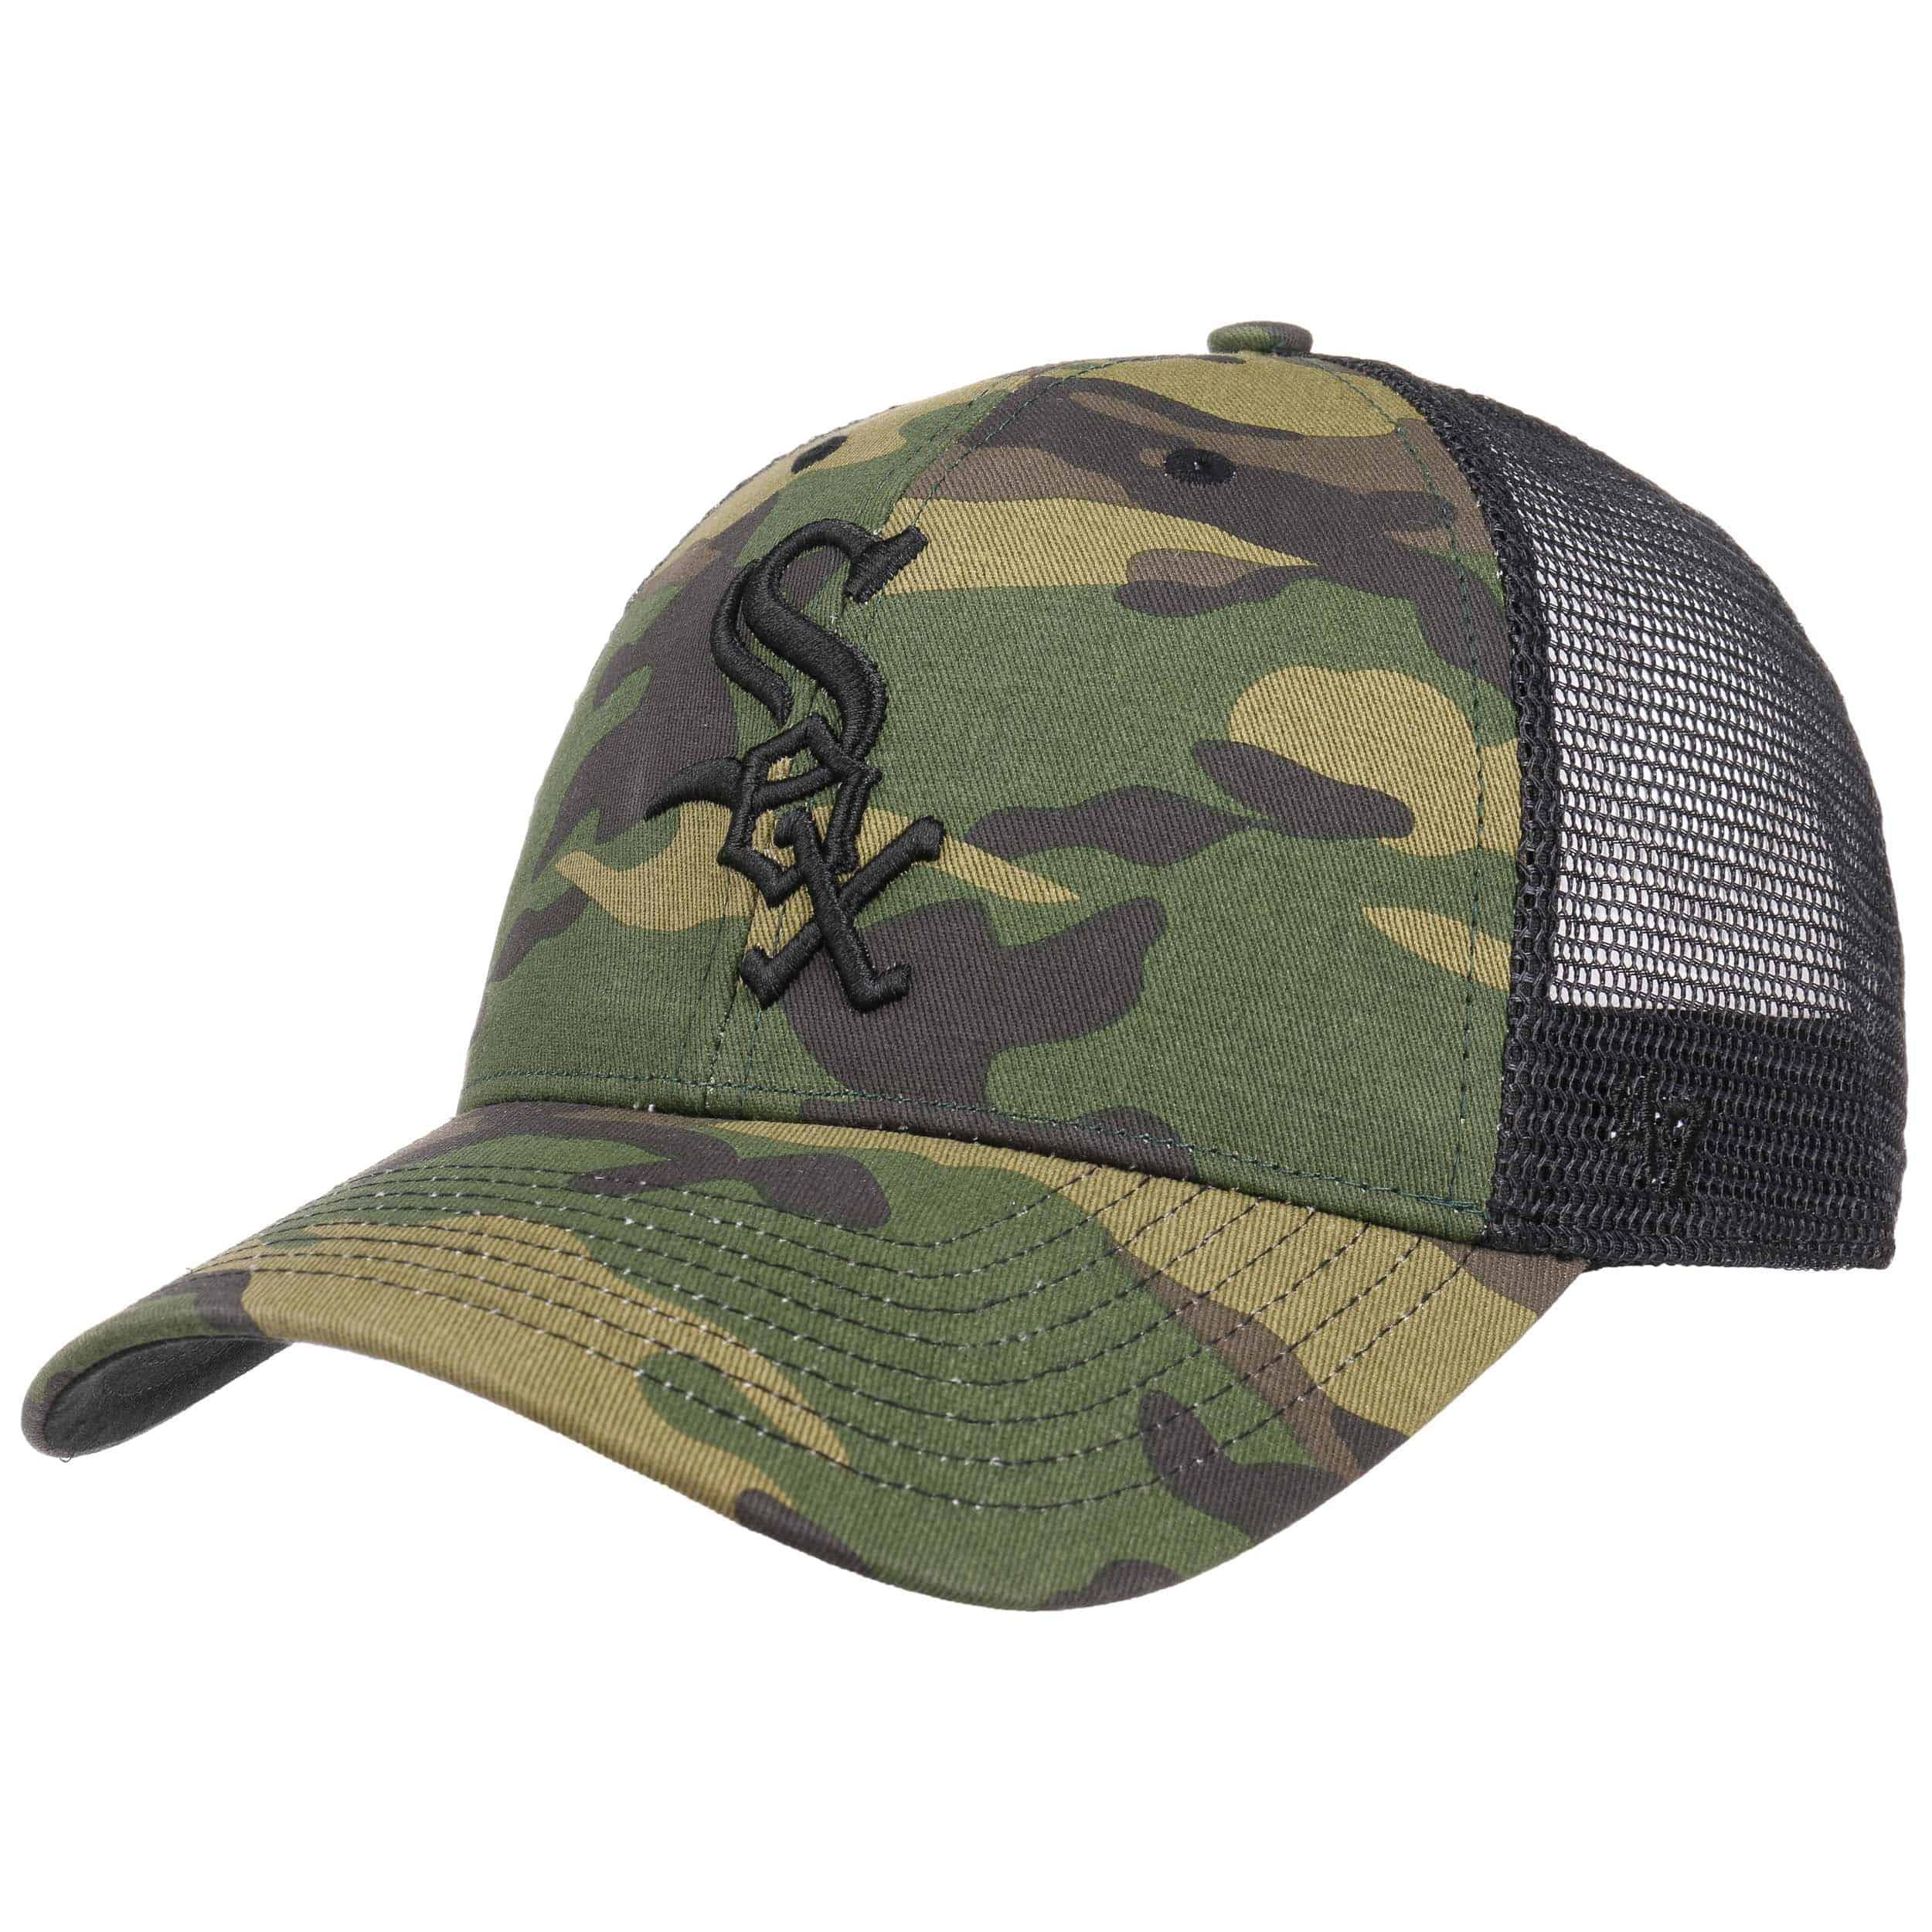 ... MVP Camo White Sox Trucker Cap by 47 Brand - camouflage 7 9067e1a2ed4